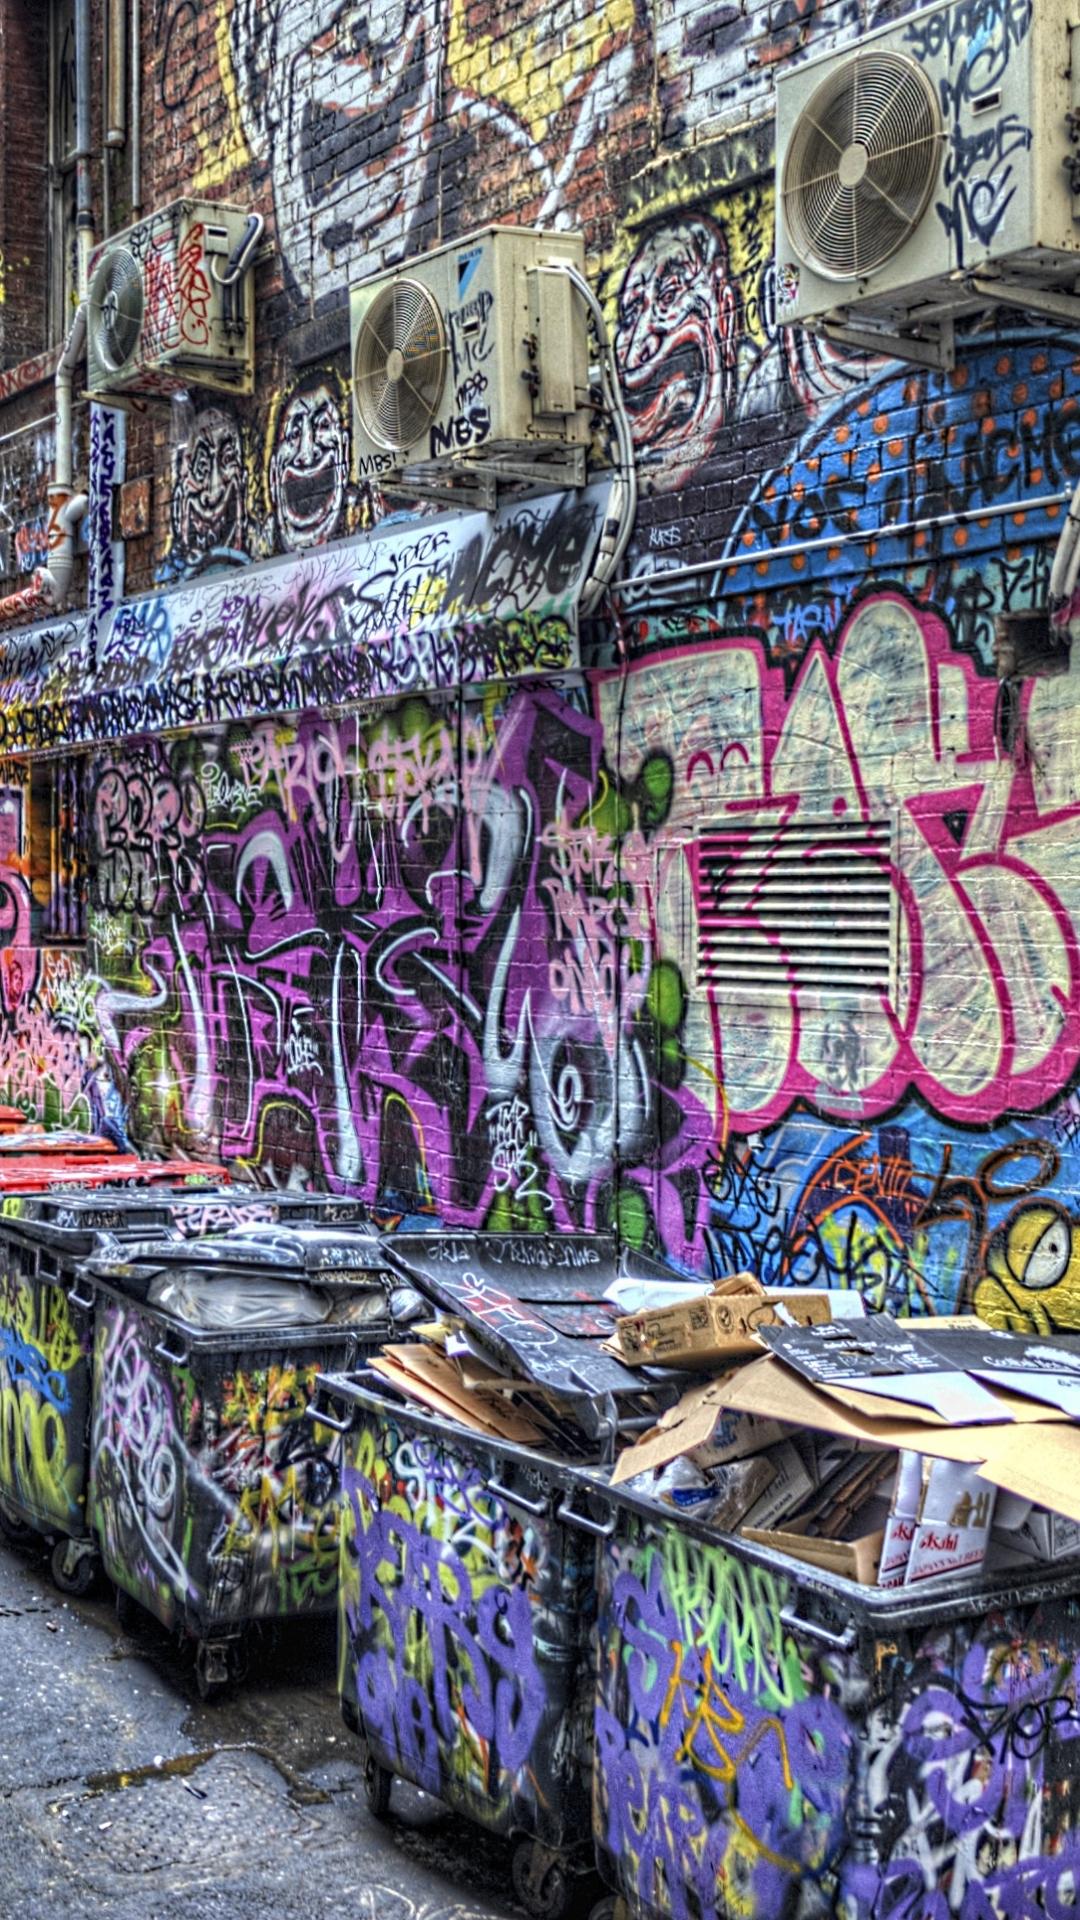 Graffiti art wallpaper iphone - Wallpaper 556427